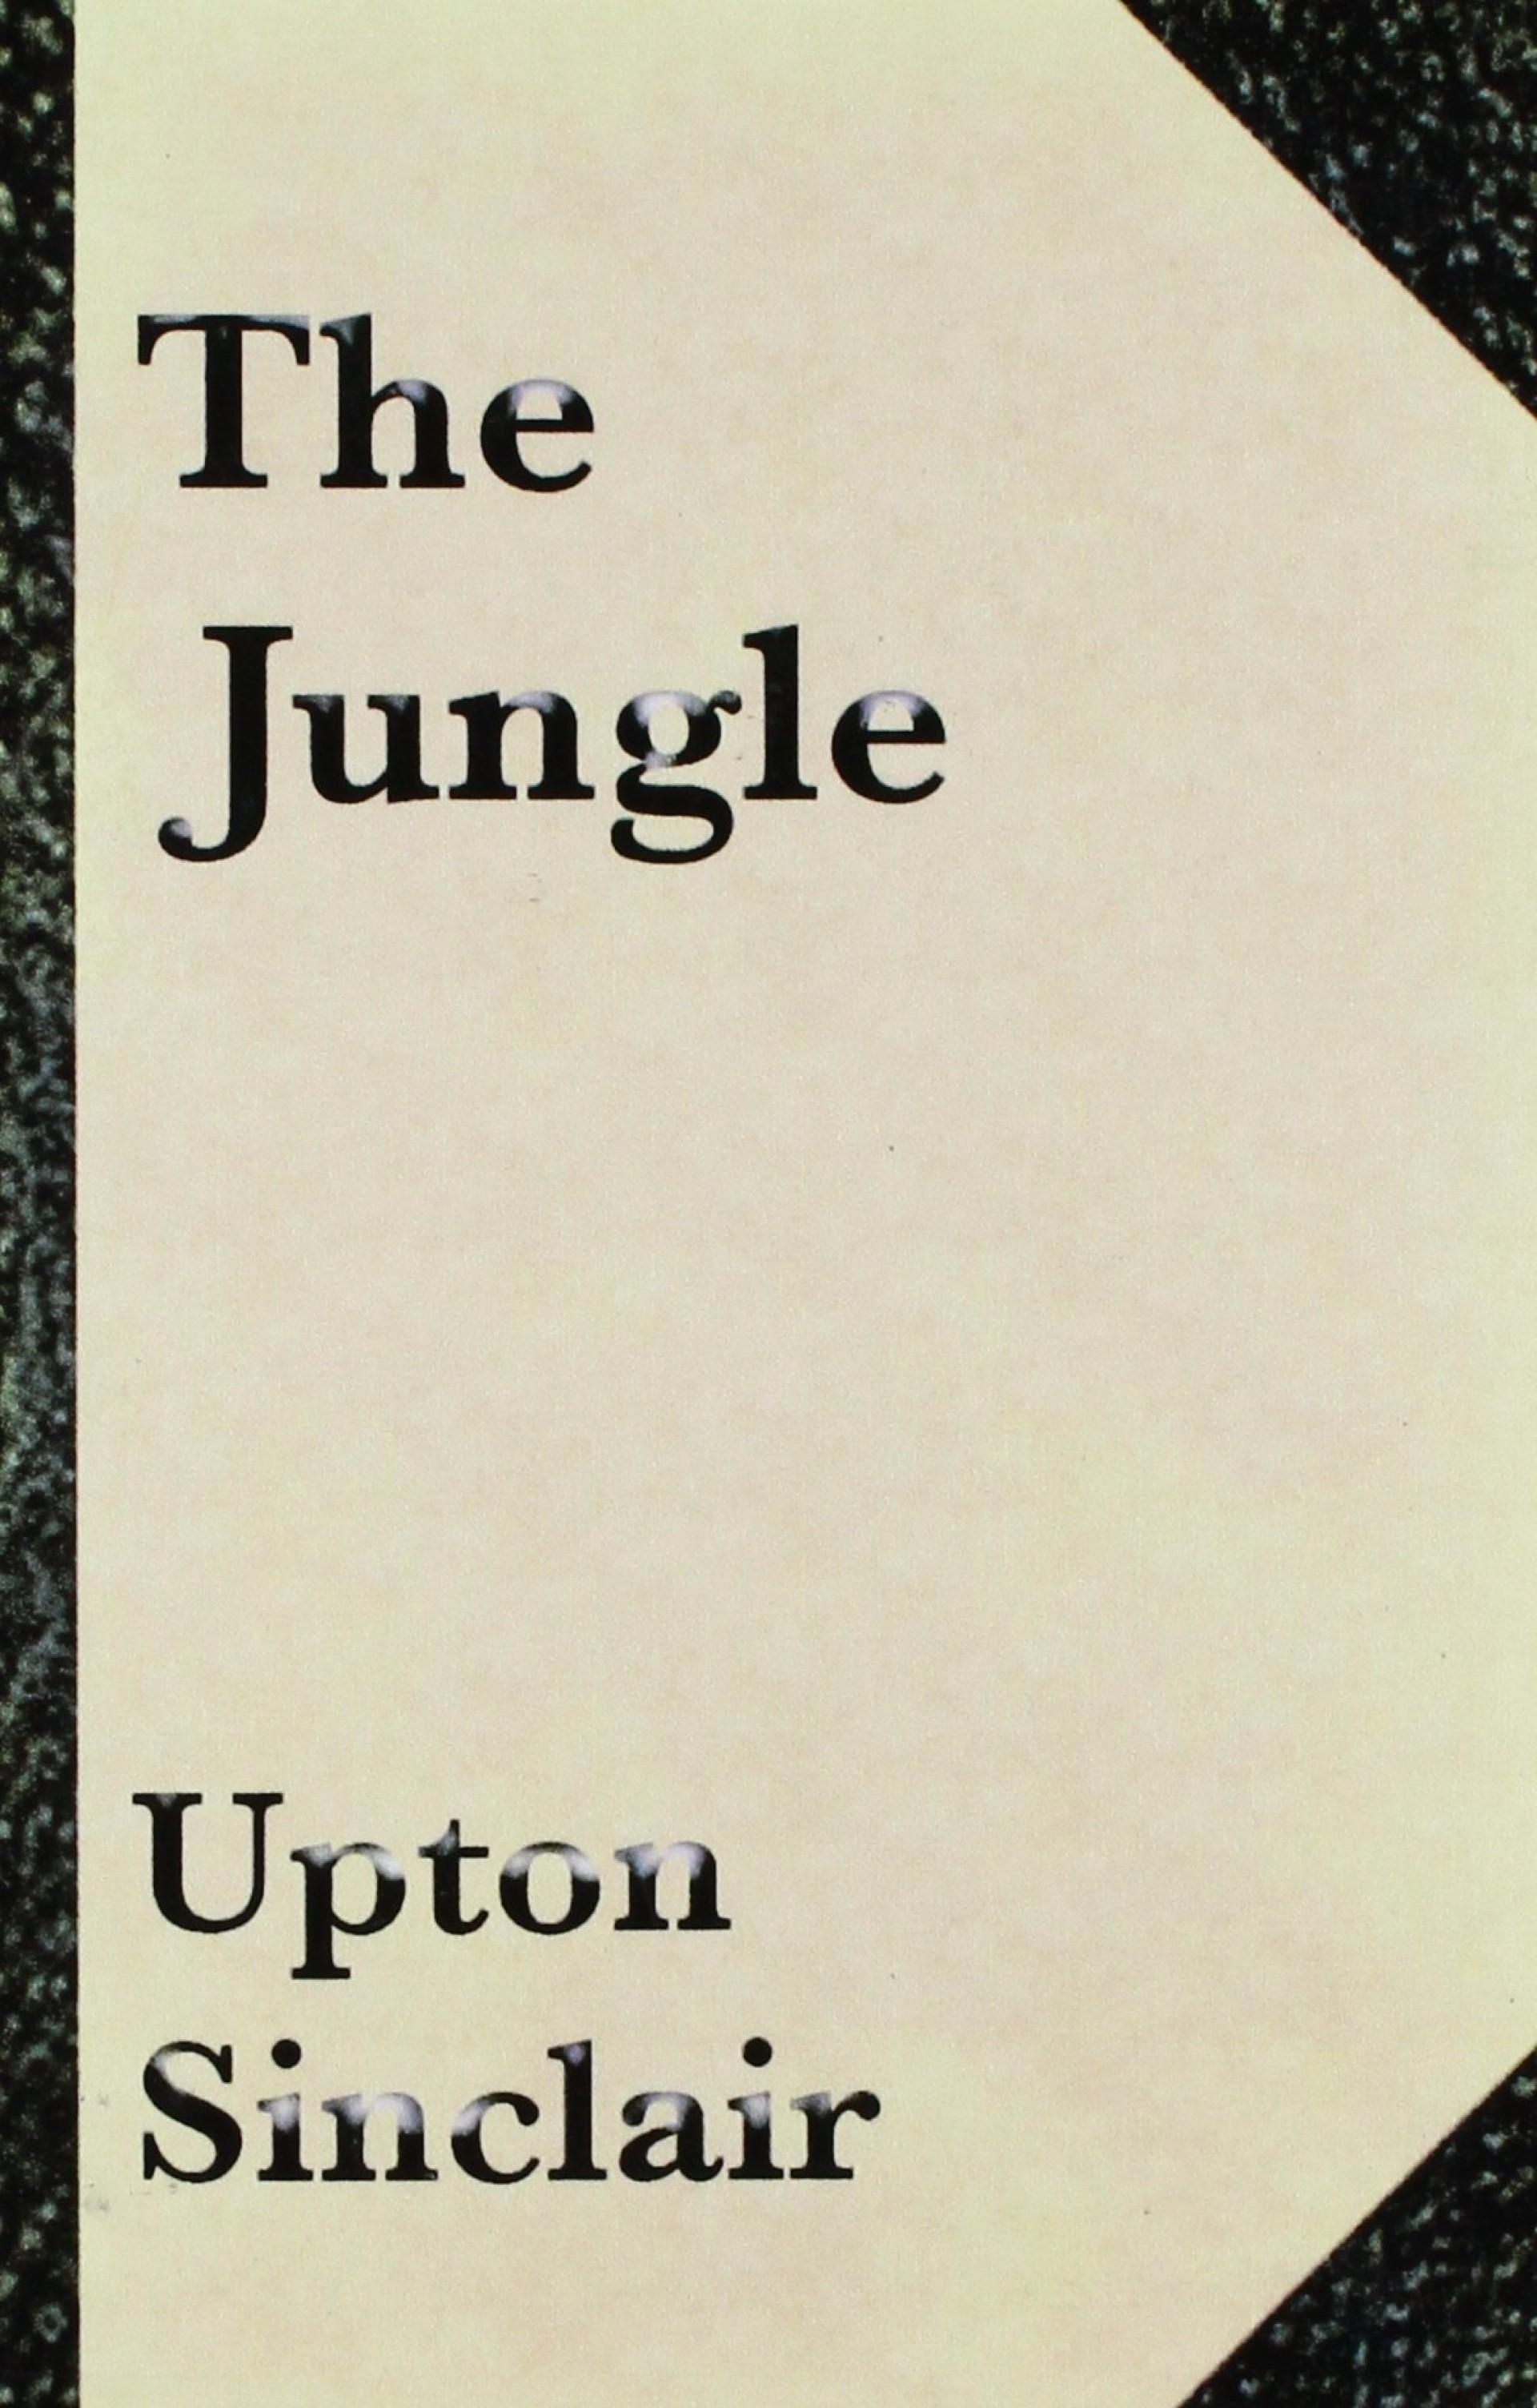 013 Essay Example 813xlafn0gl The Jungle Upton Sinclair Book Rare Review 1920